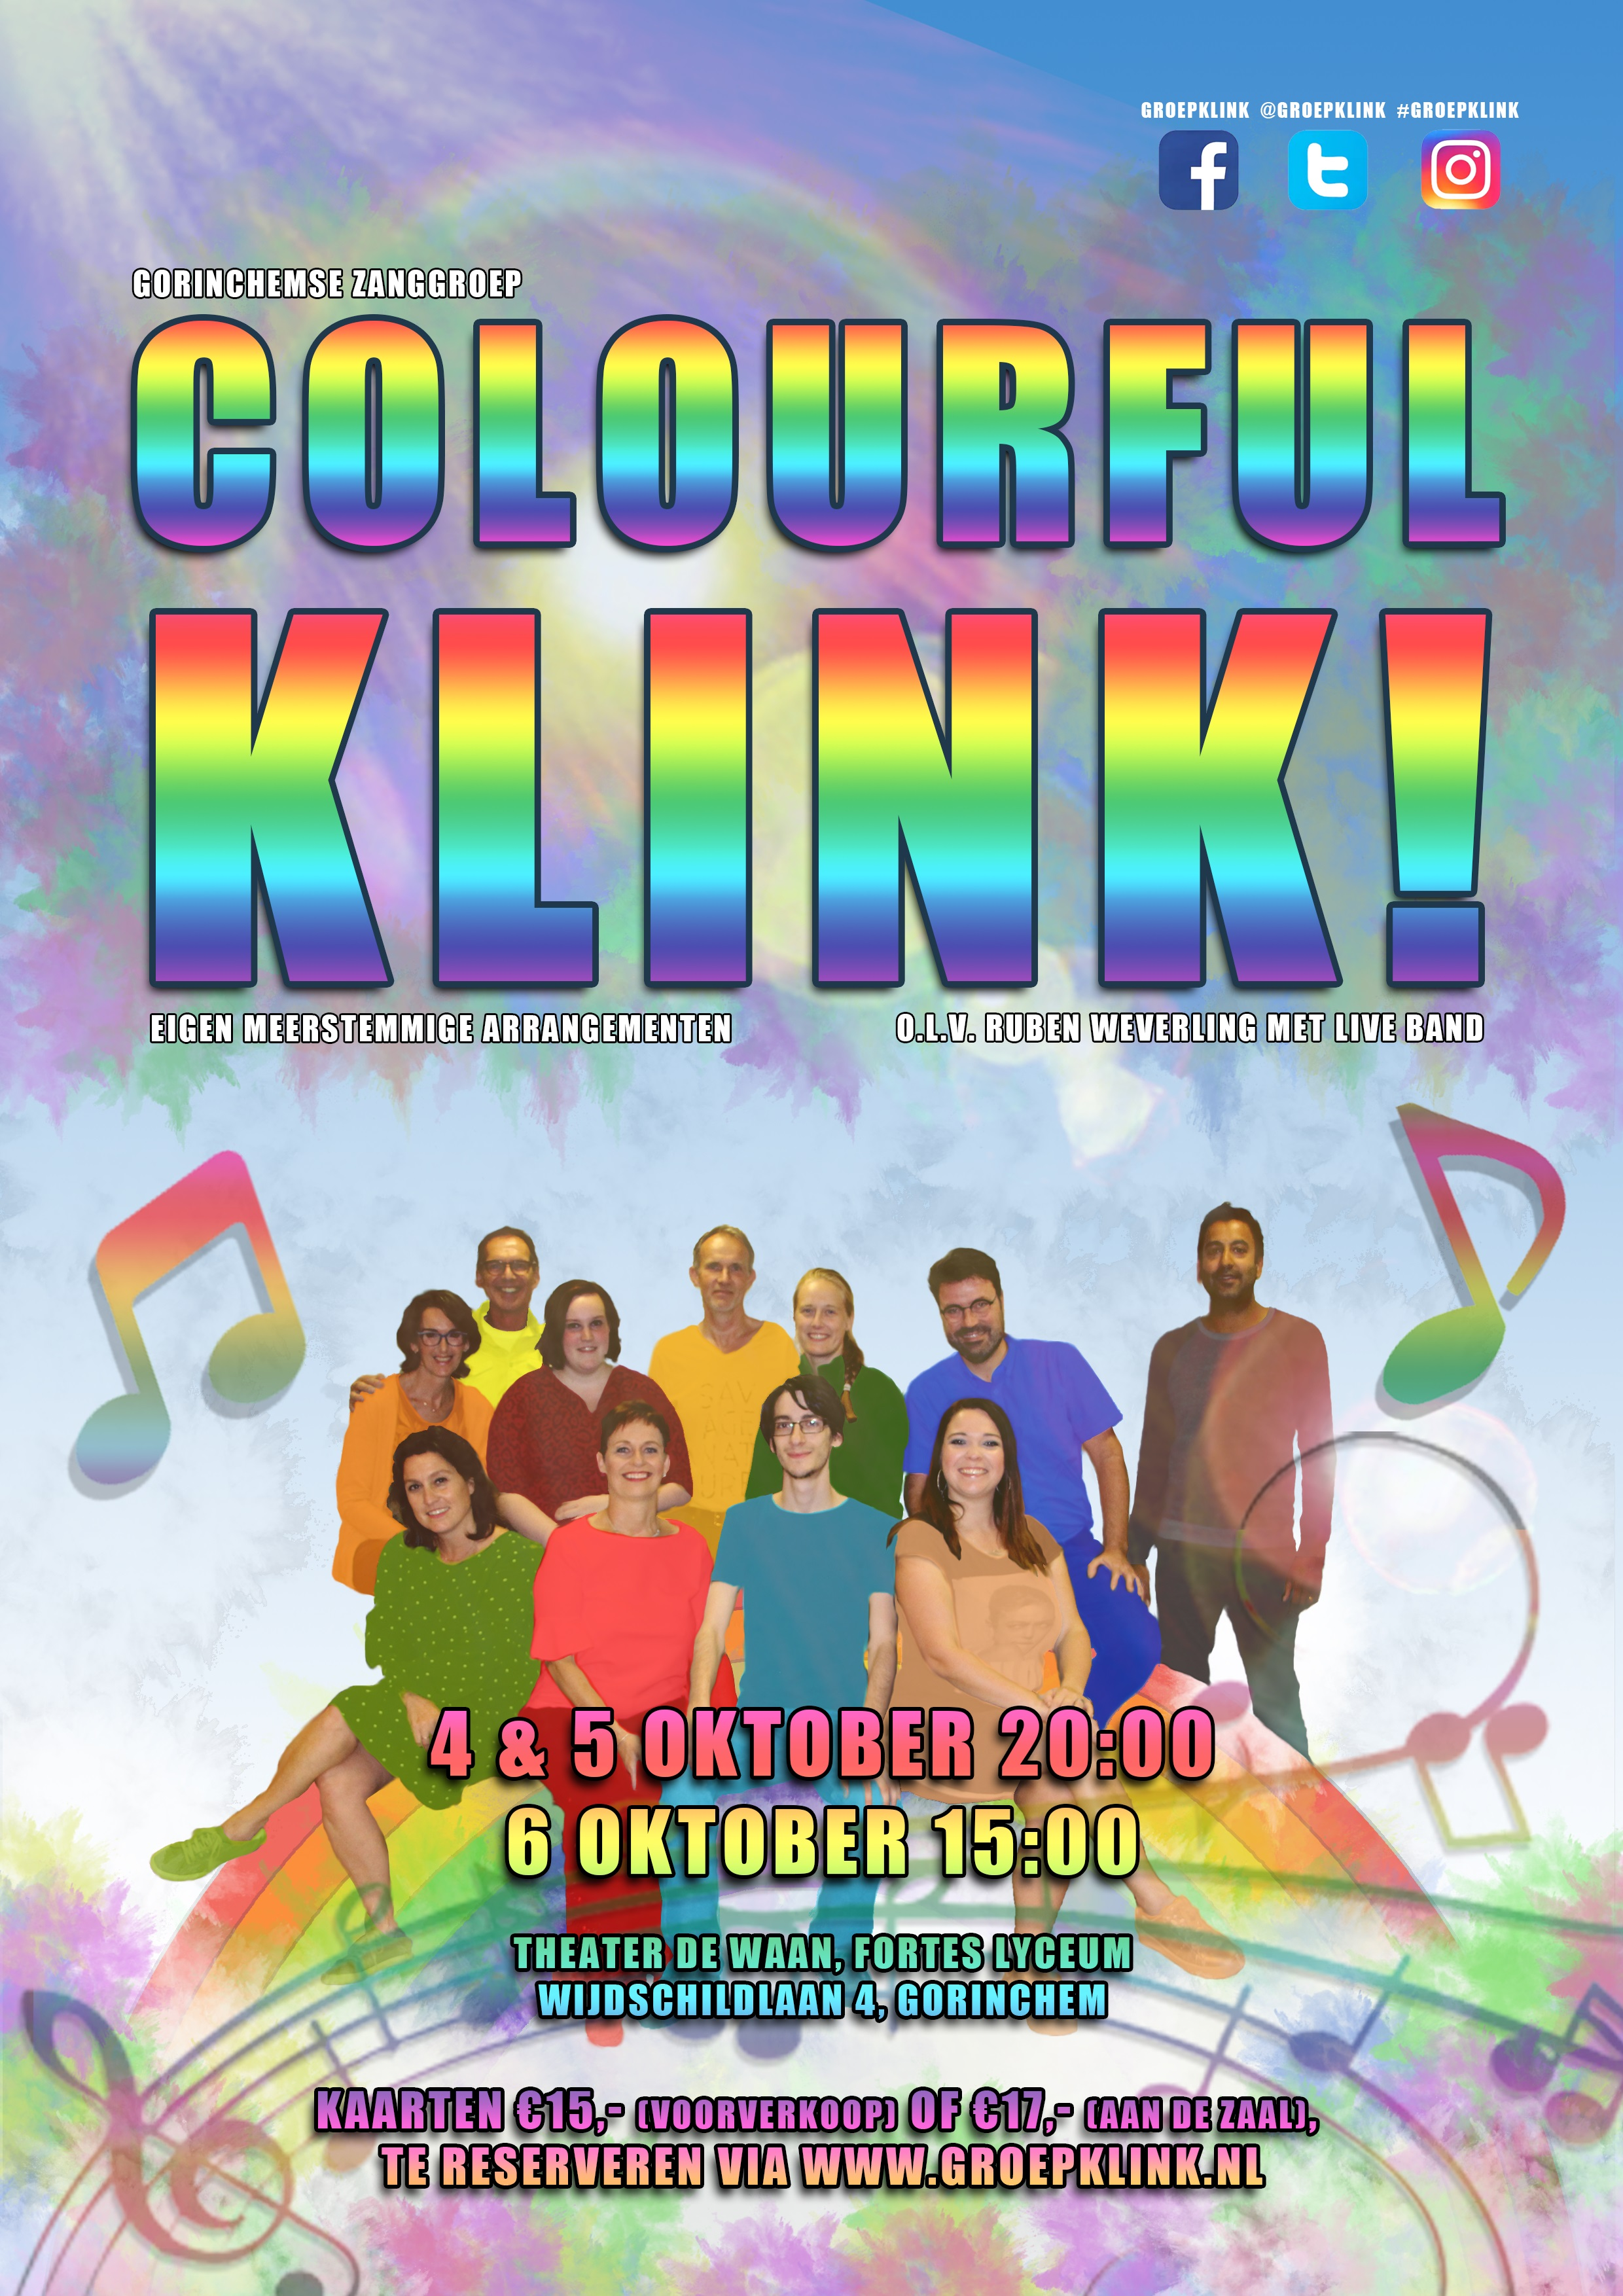 Colourful KLINK! @ theater De Waan (Fortes Lyceum Gorinchem)